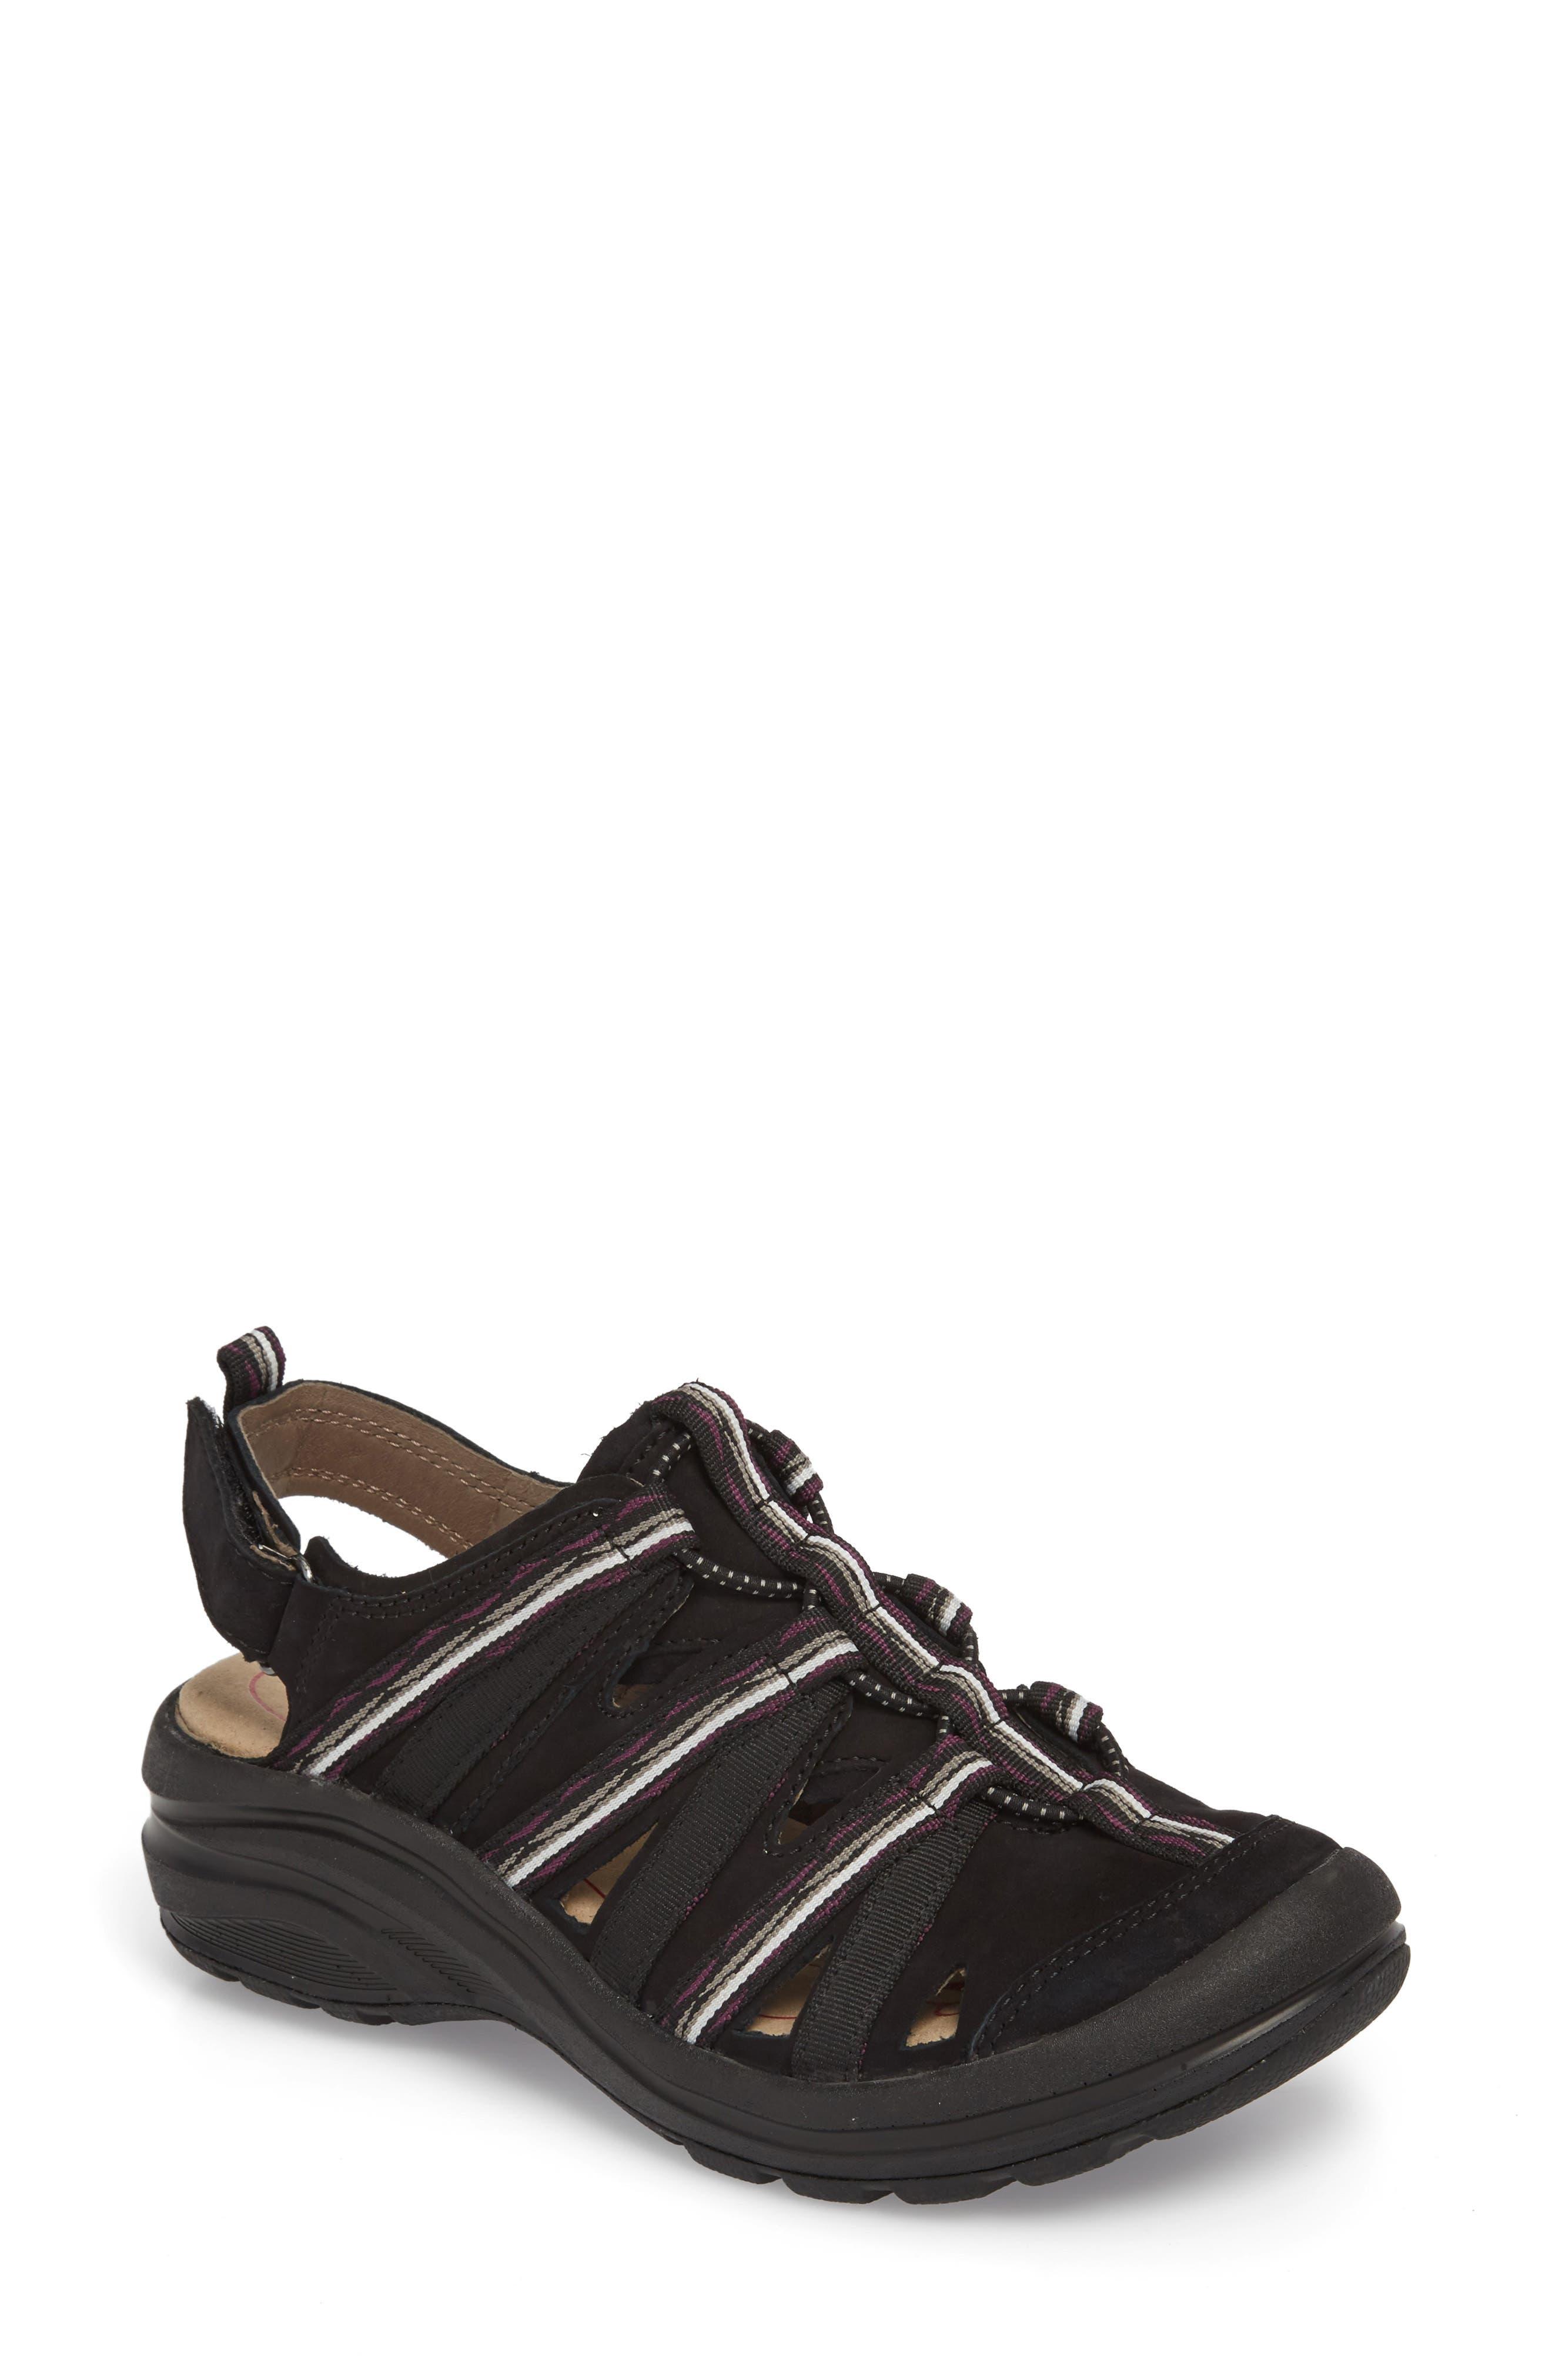 Image of bionica Malabar Sport Sandal